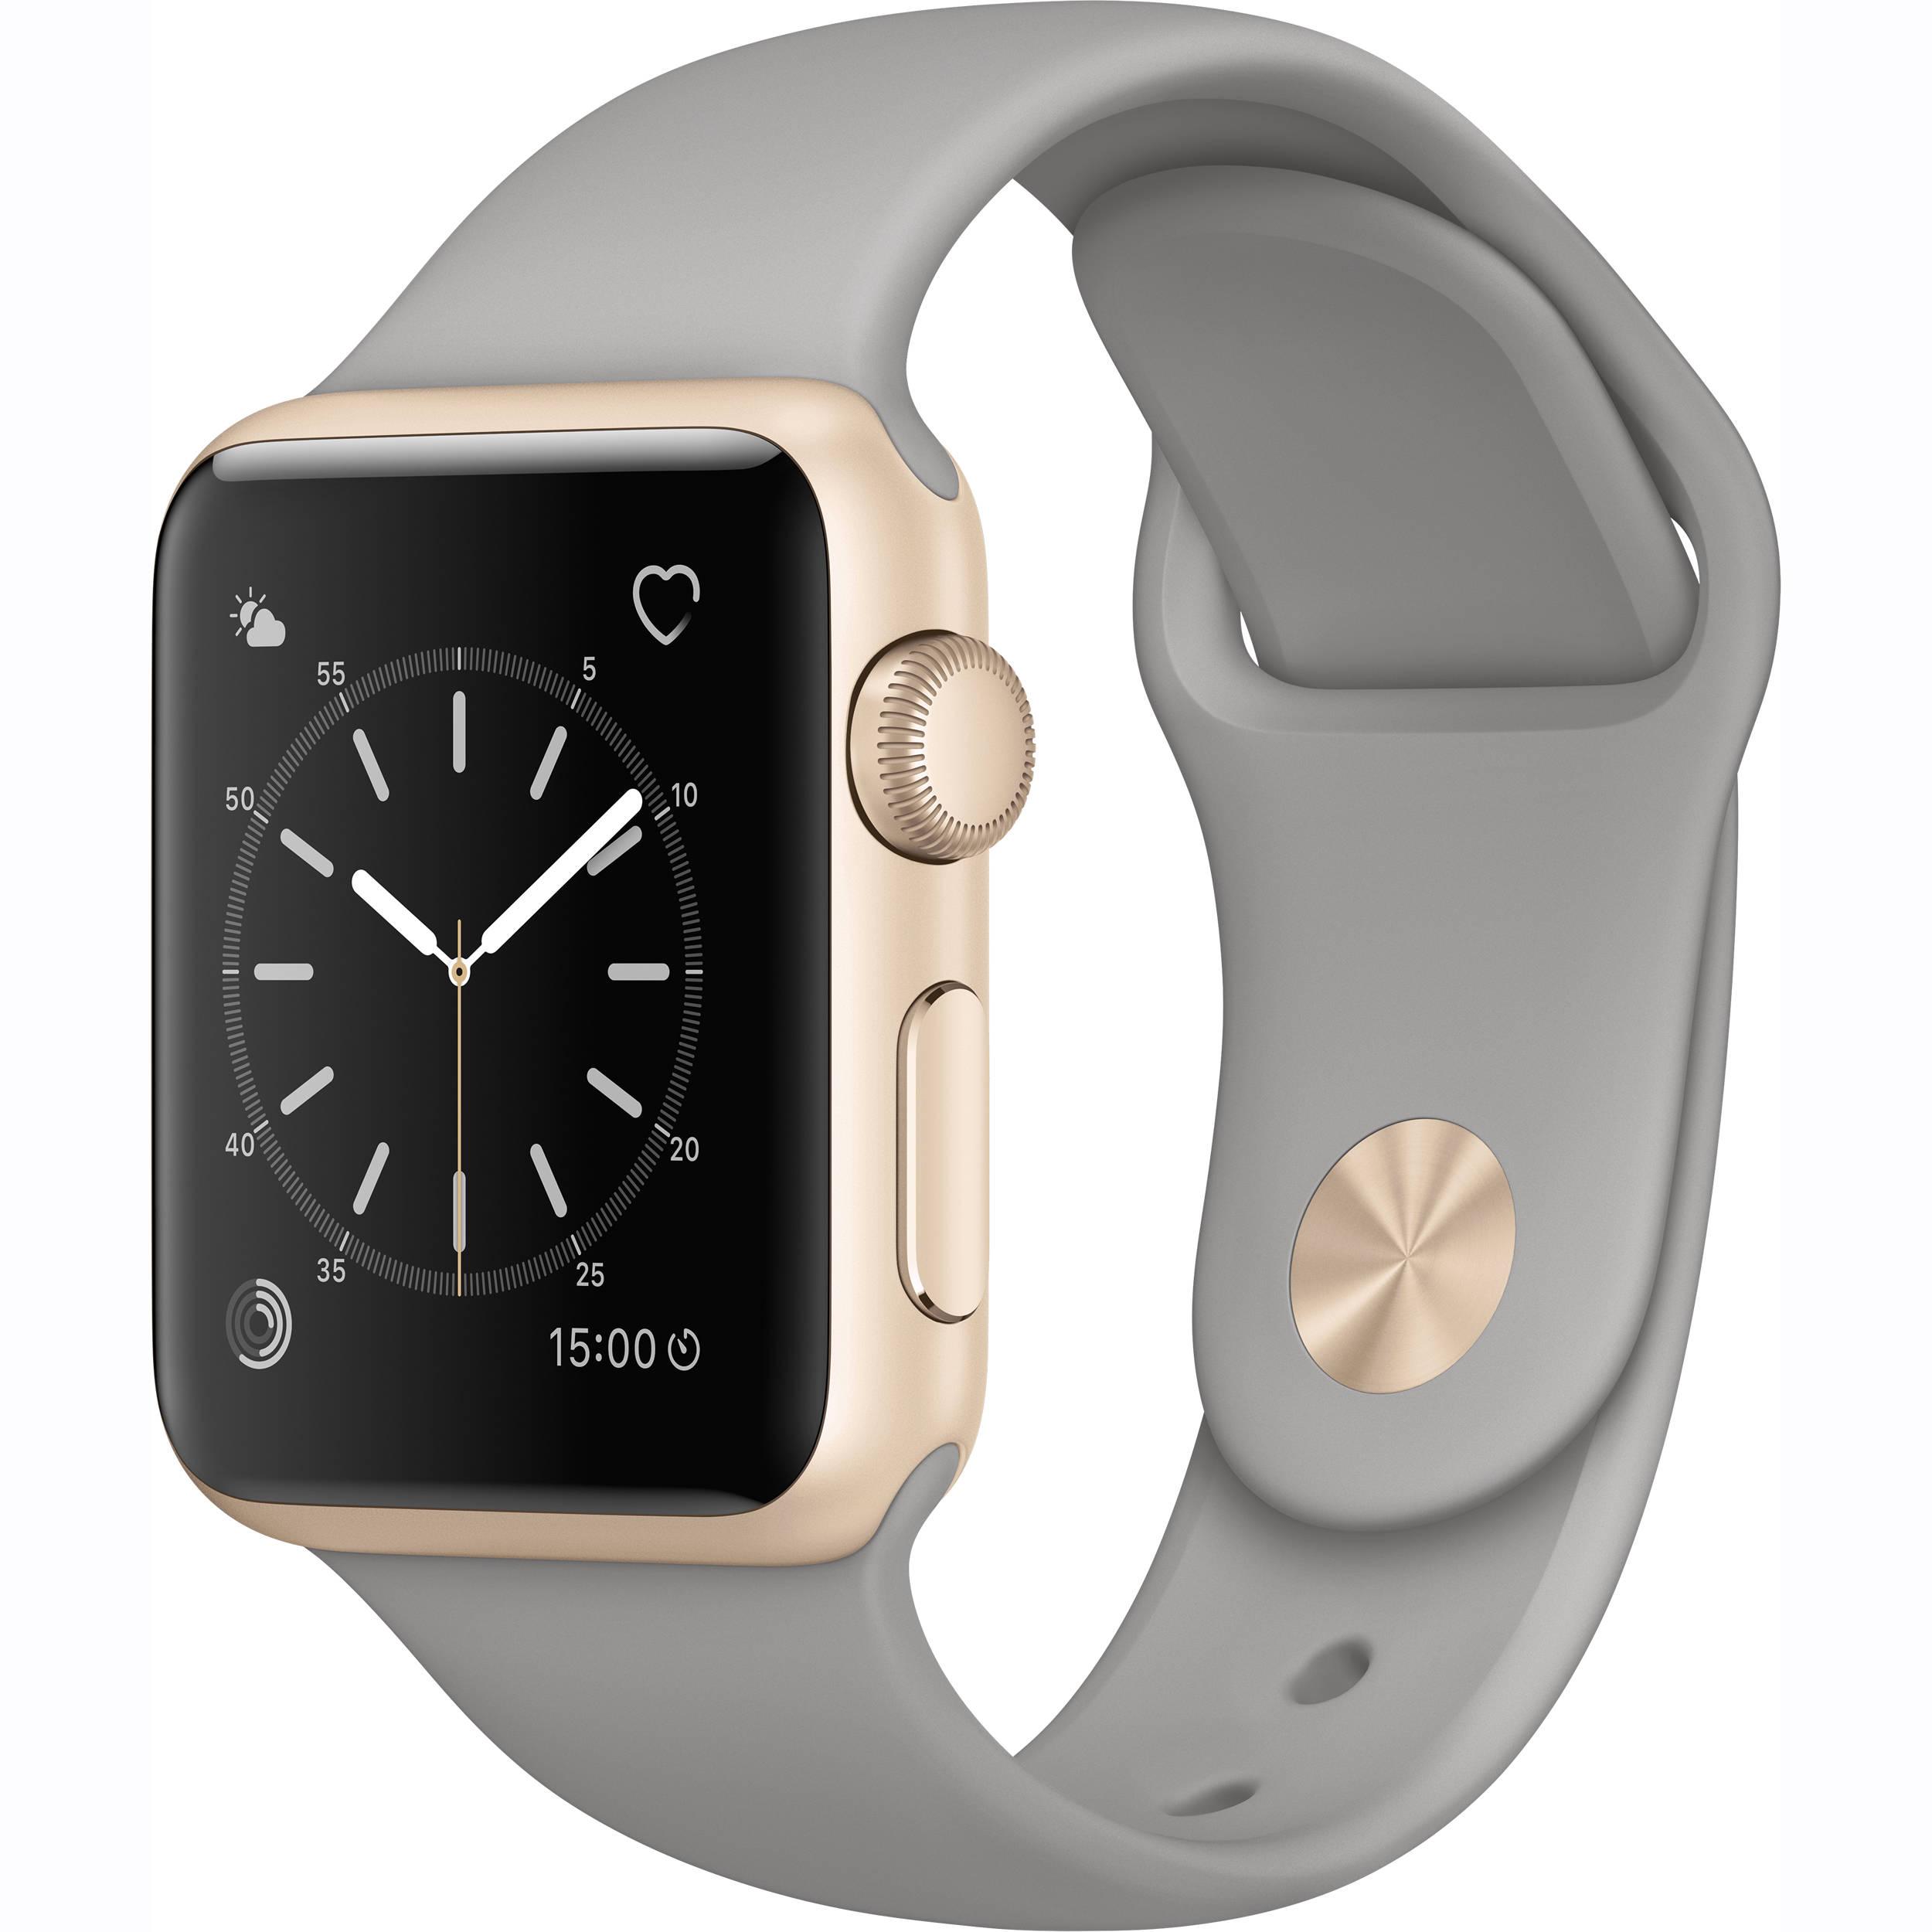 detailed look a8abf f9e7d Apple Watch Series 1 38mm Smartwatch (Gold Aluminum Case, Concrete Sport  Band)